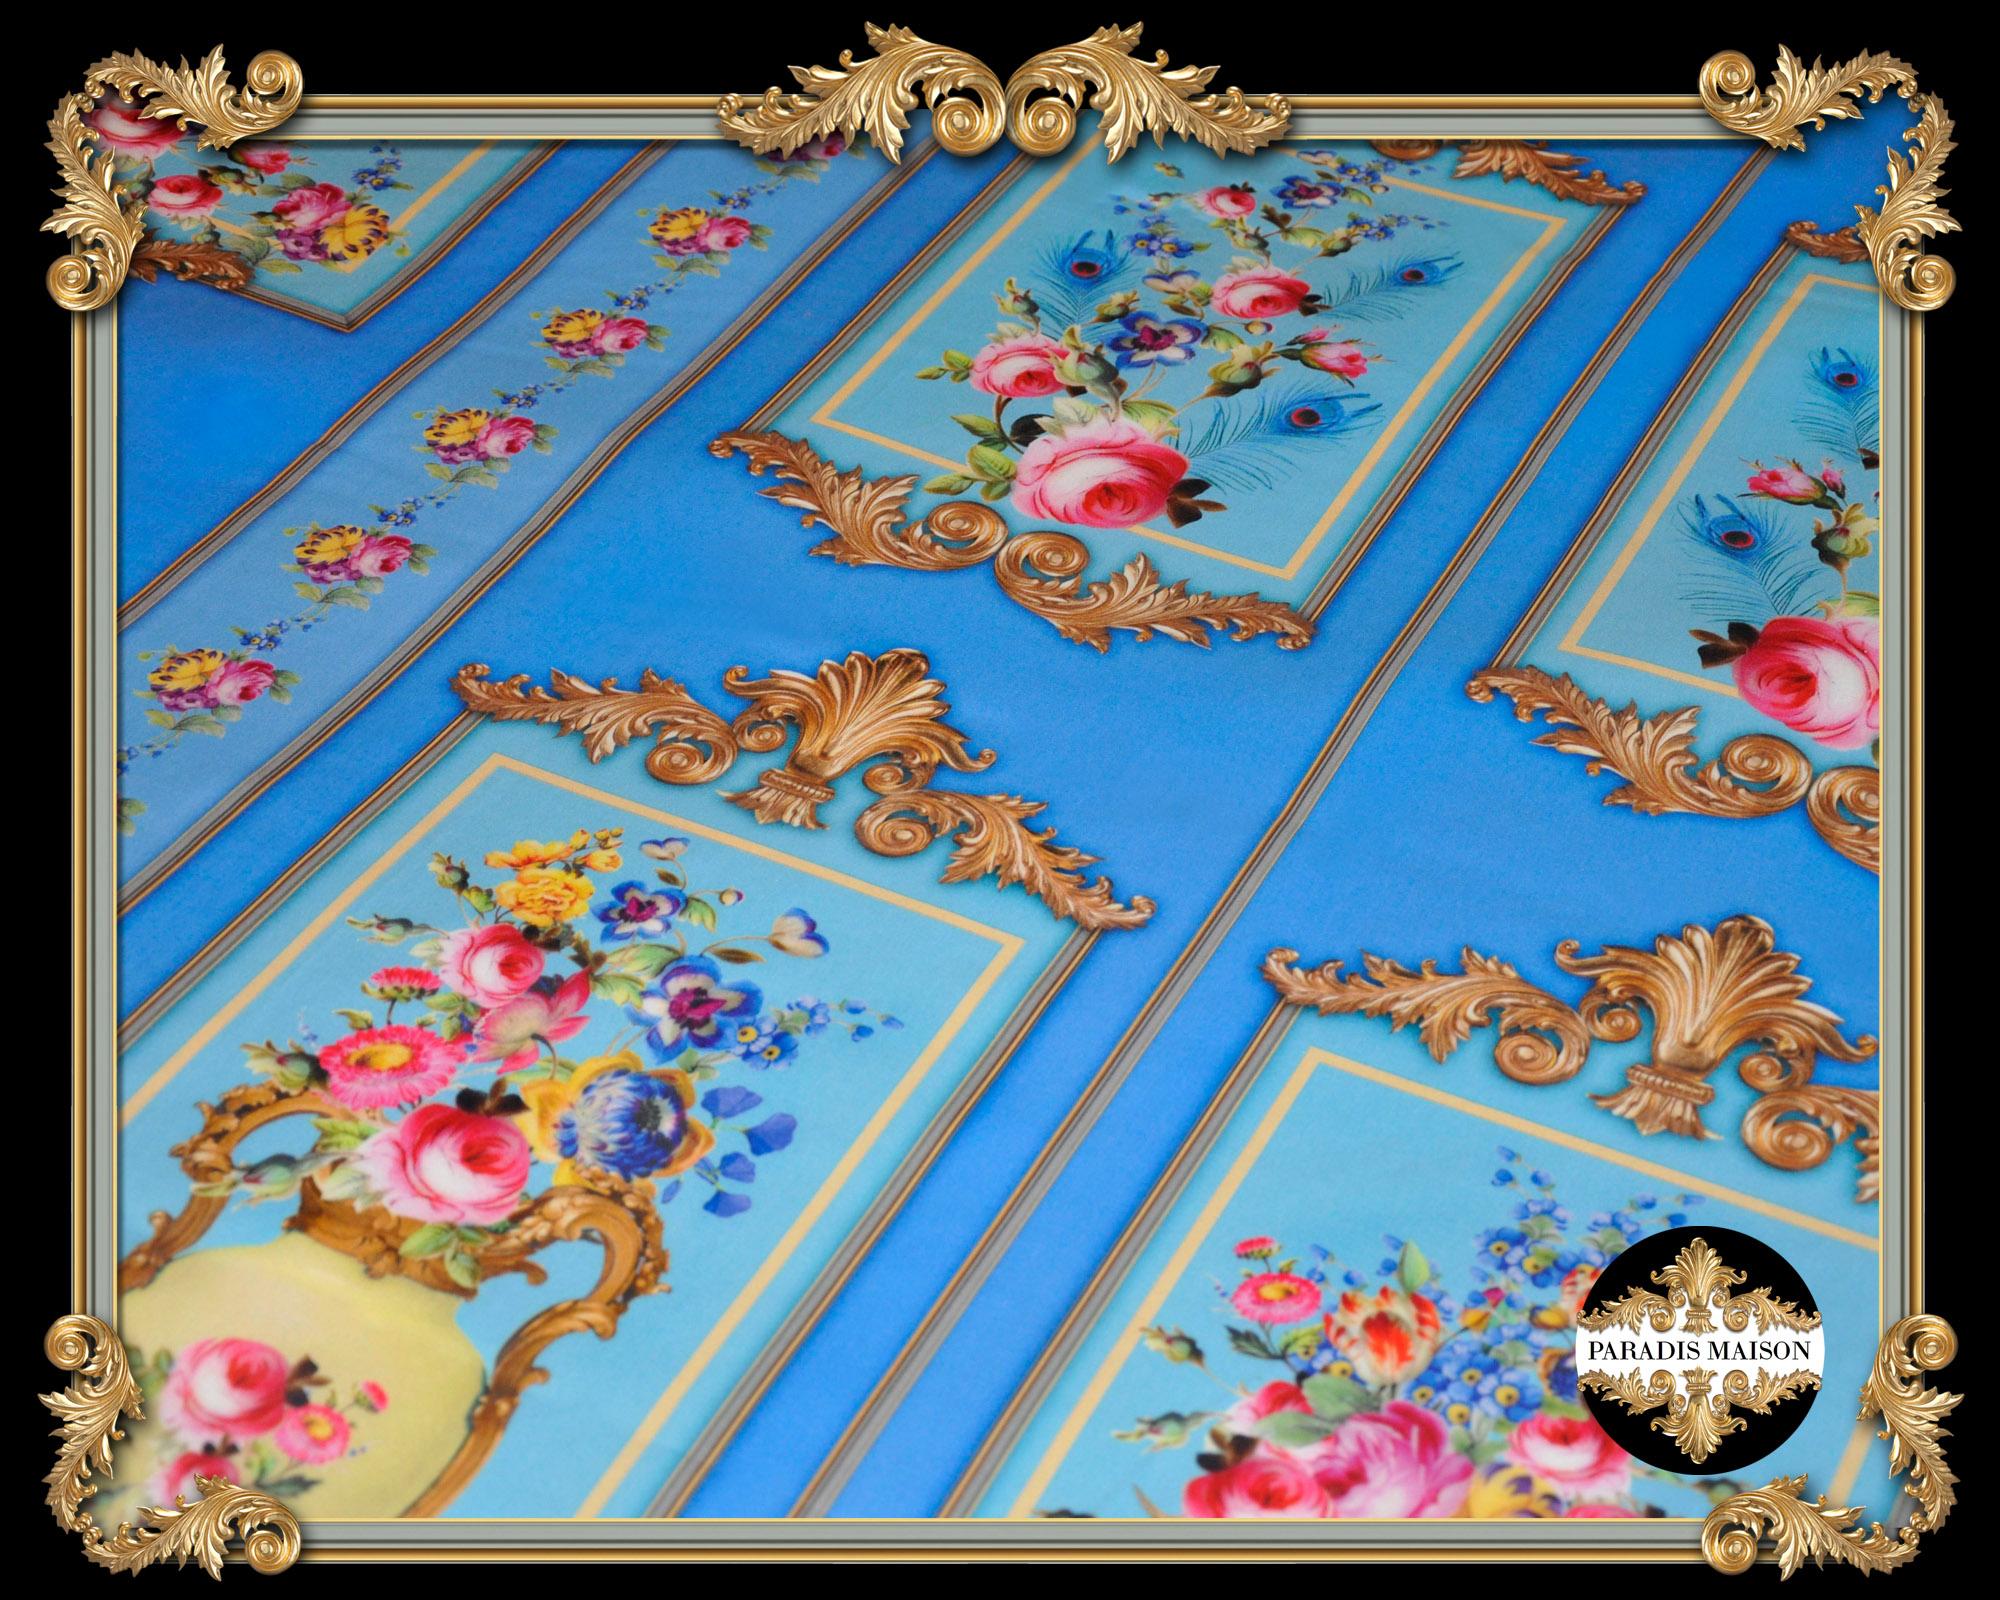 ornate french style duvet cover